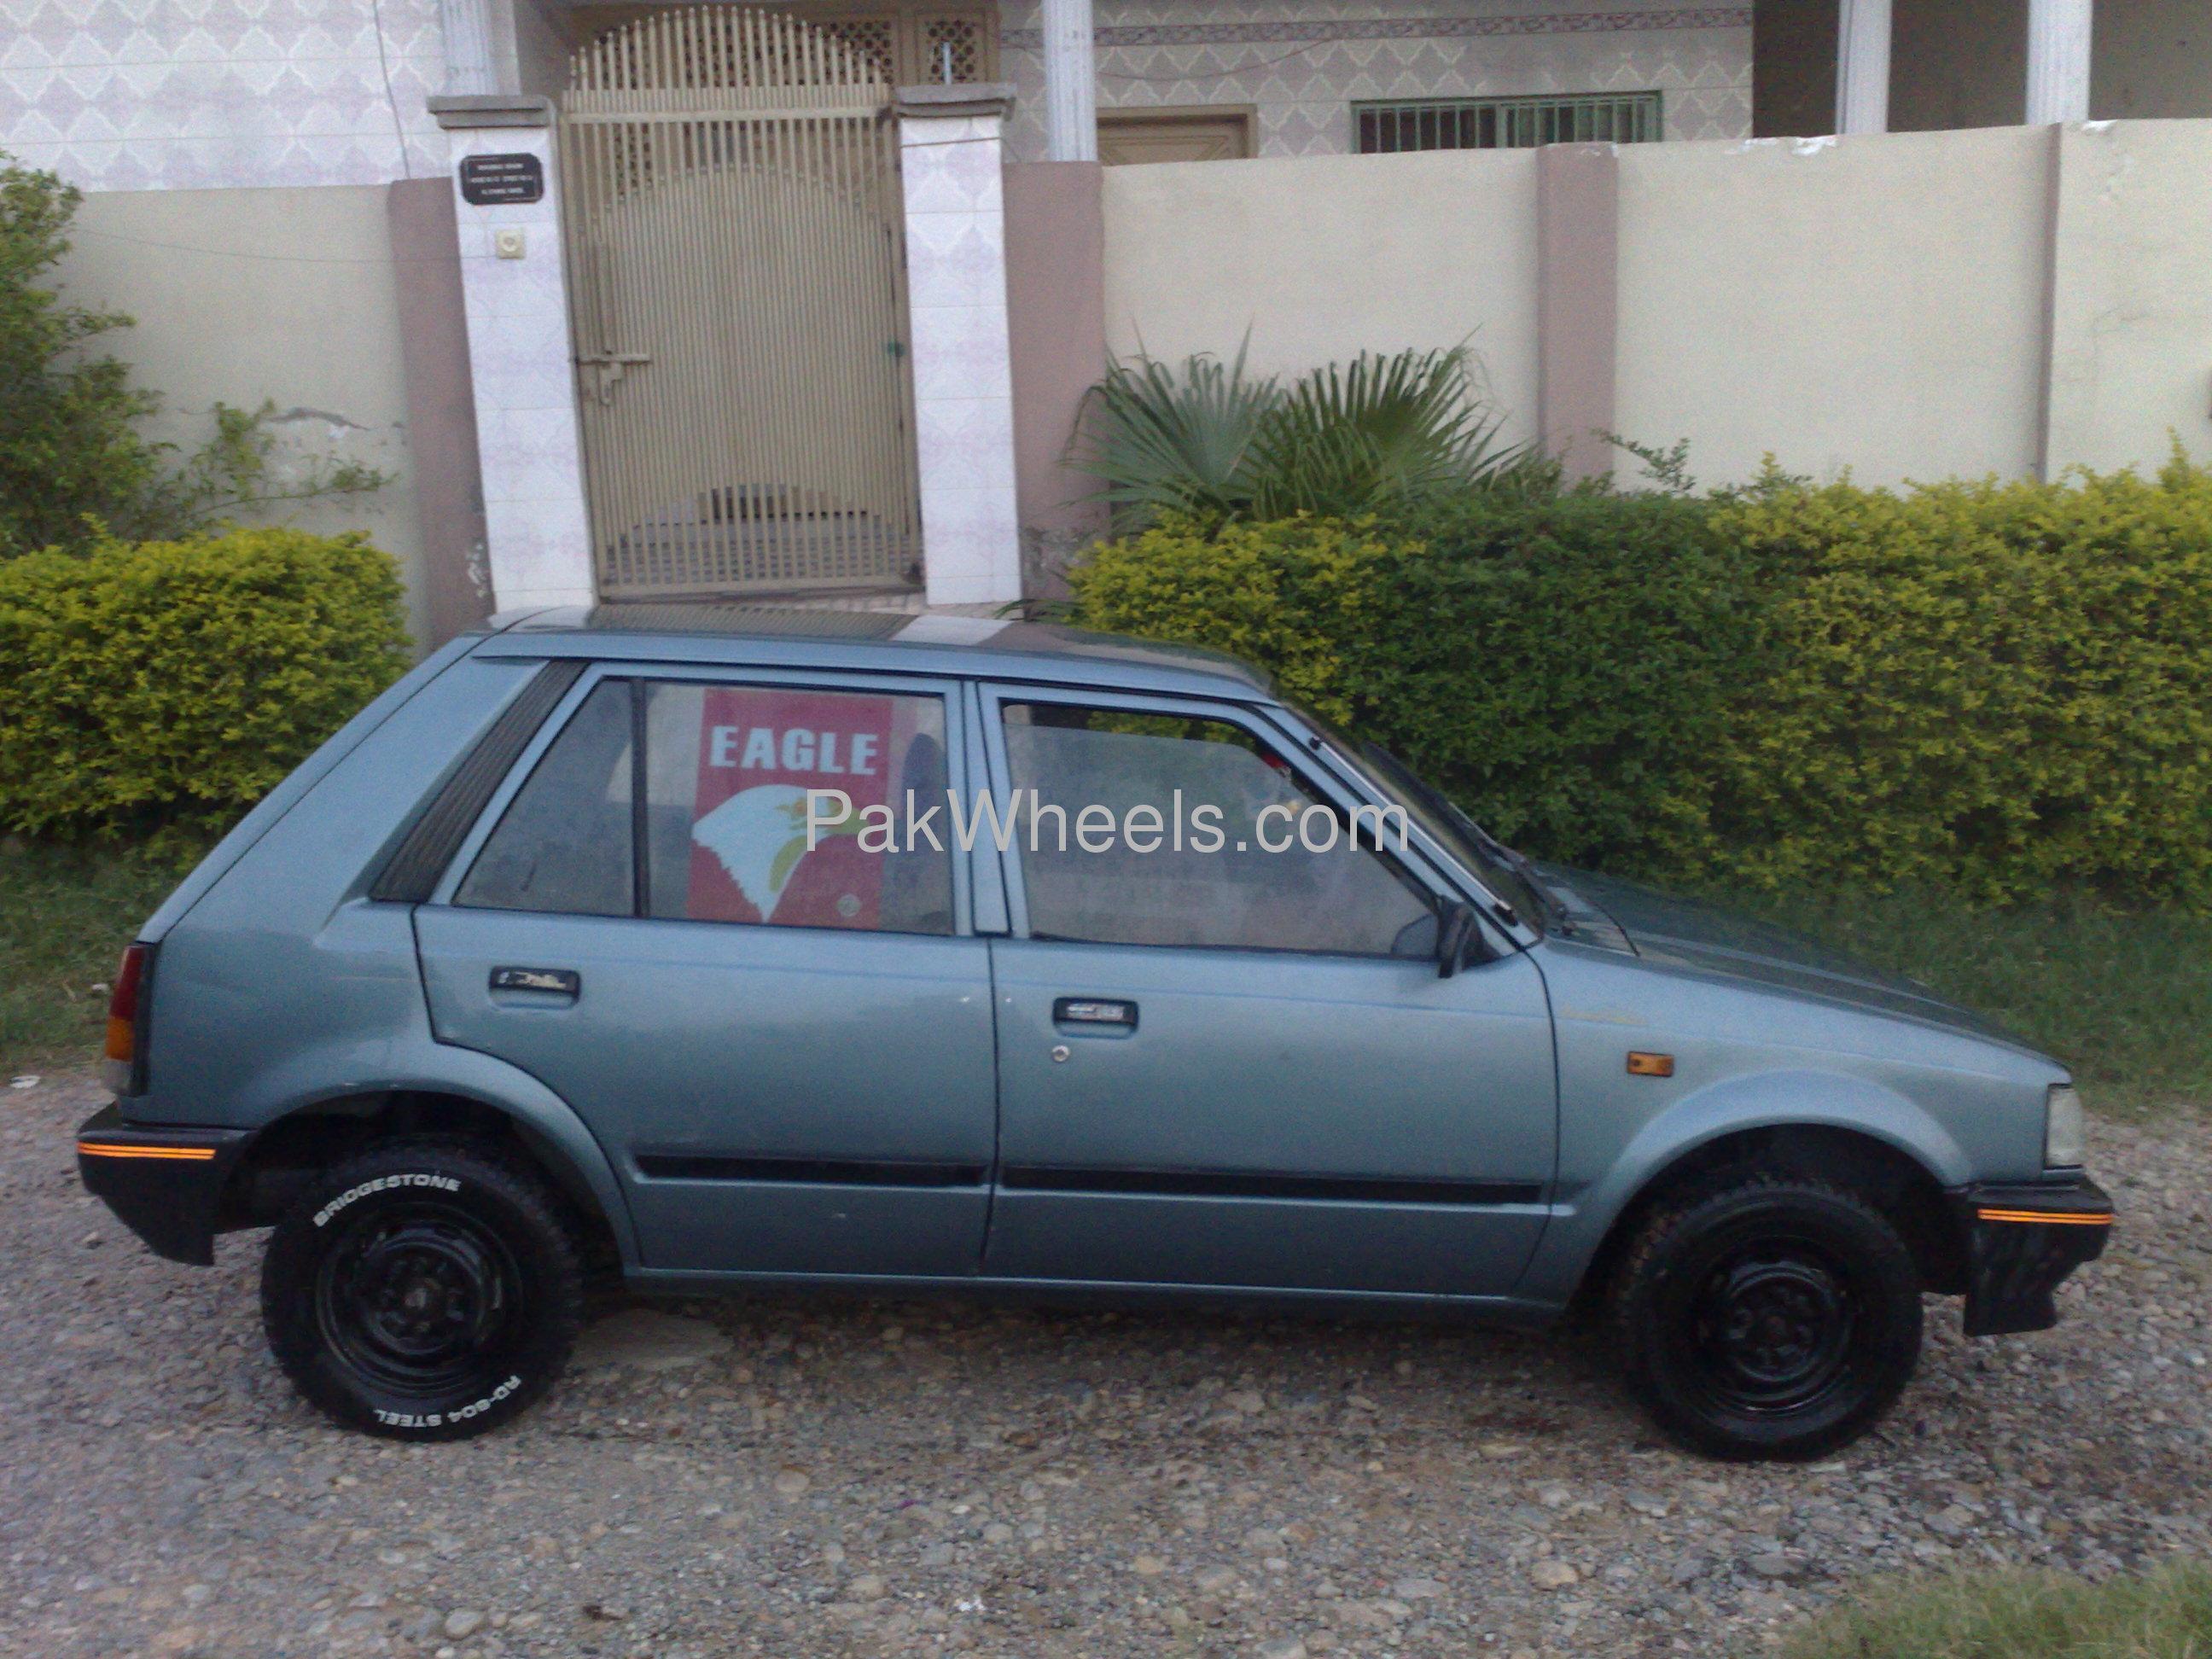 Daihatsu Charade 1985 For Sale In Rawalpindi PakWheels on 1985 Daihatsu Charade Engine Parts